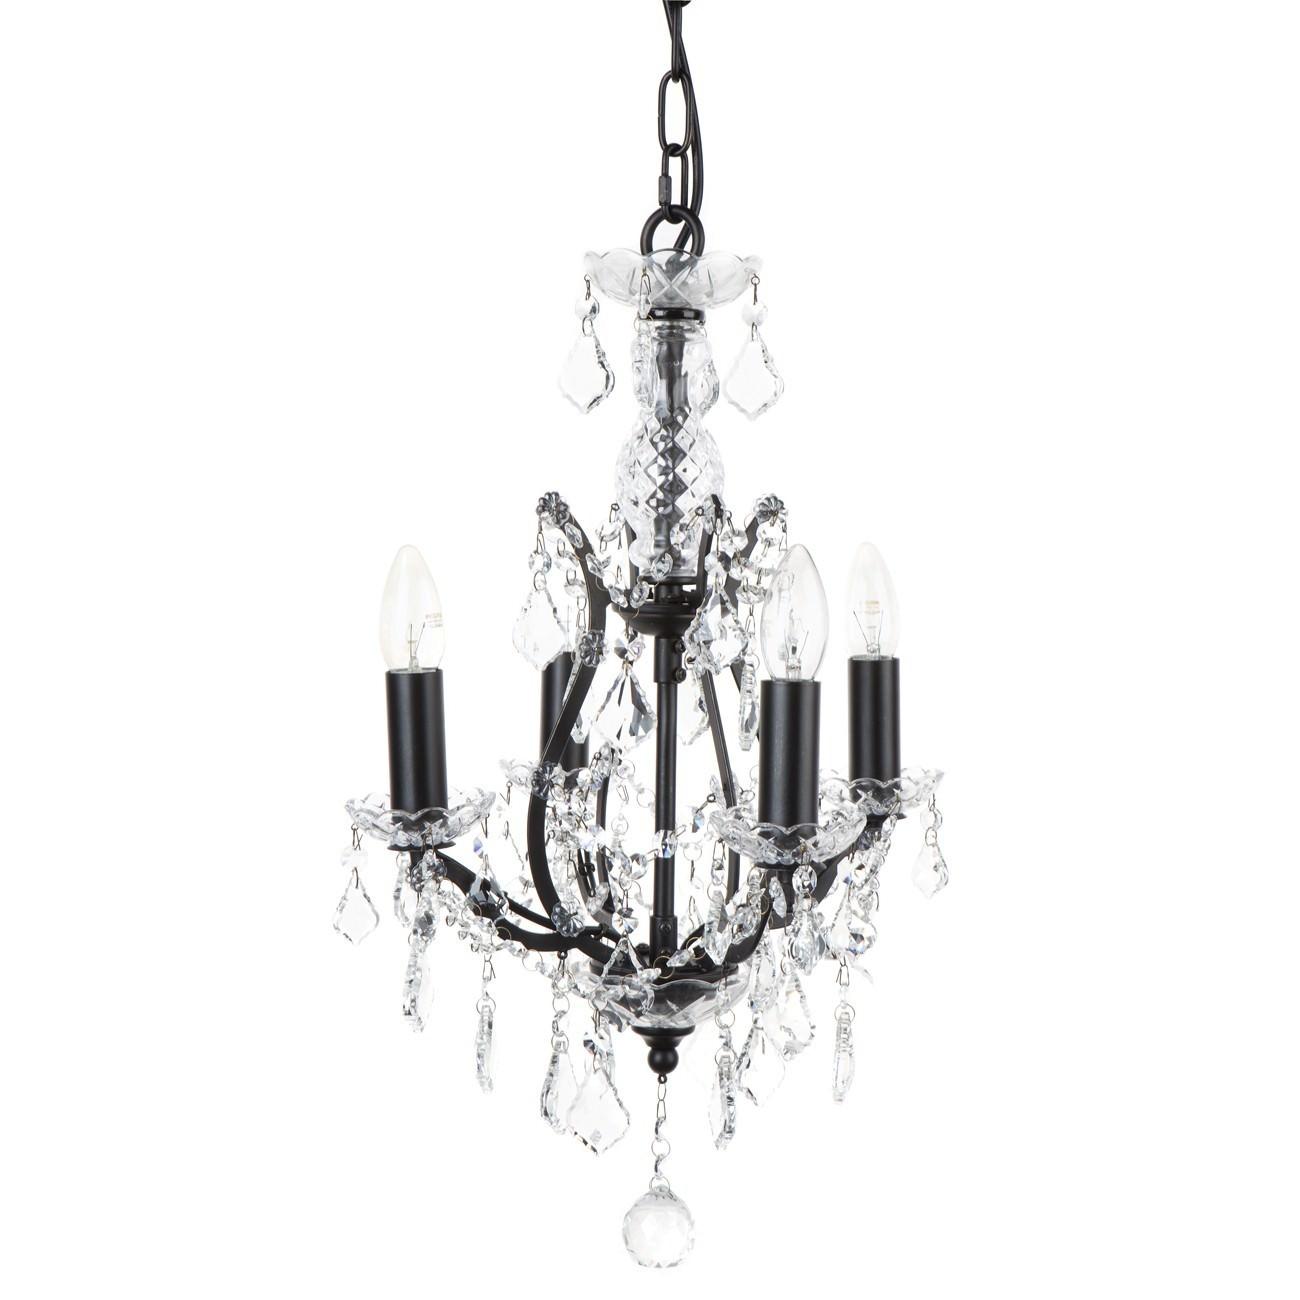 Waldorf Iron & Glass Chandelier, 4 Arm